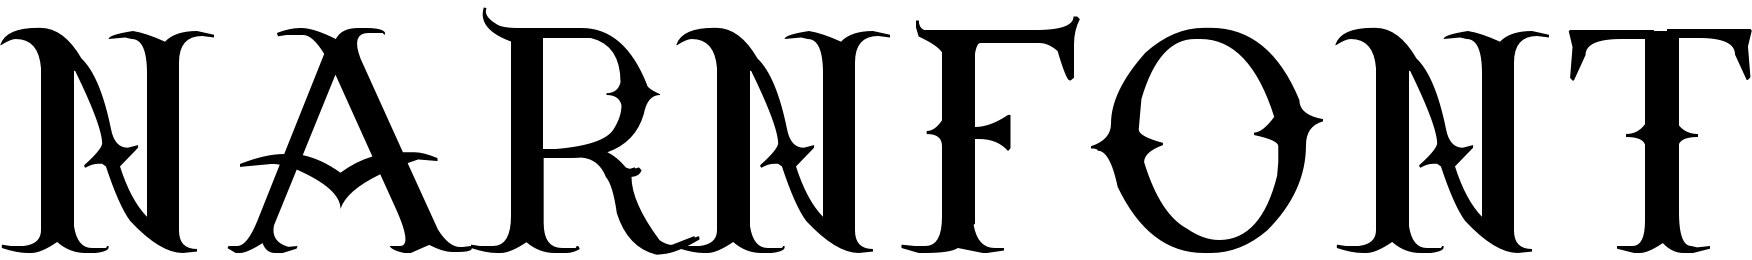 Narnfont